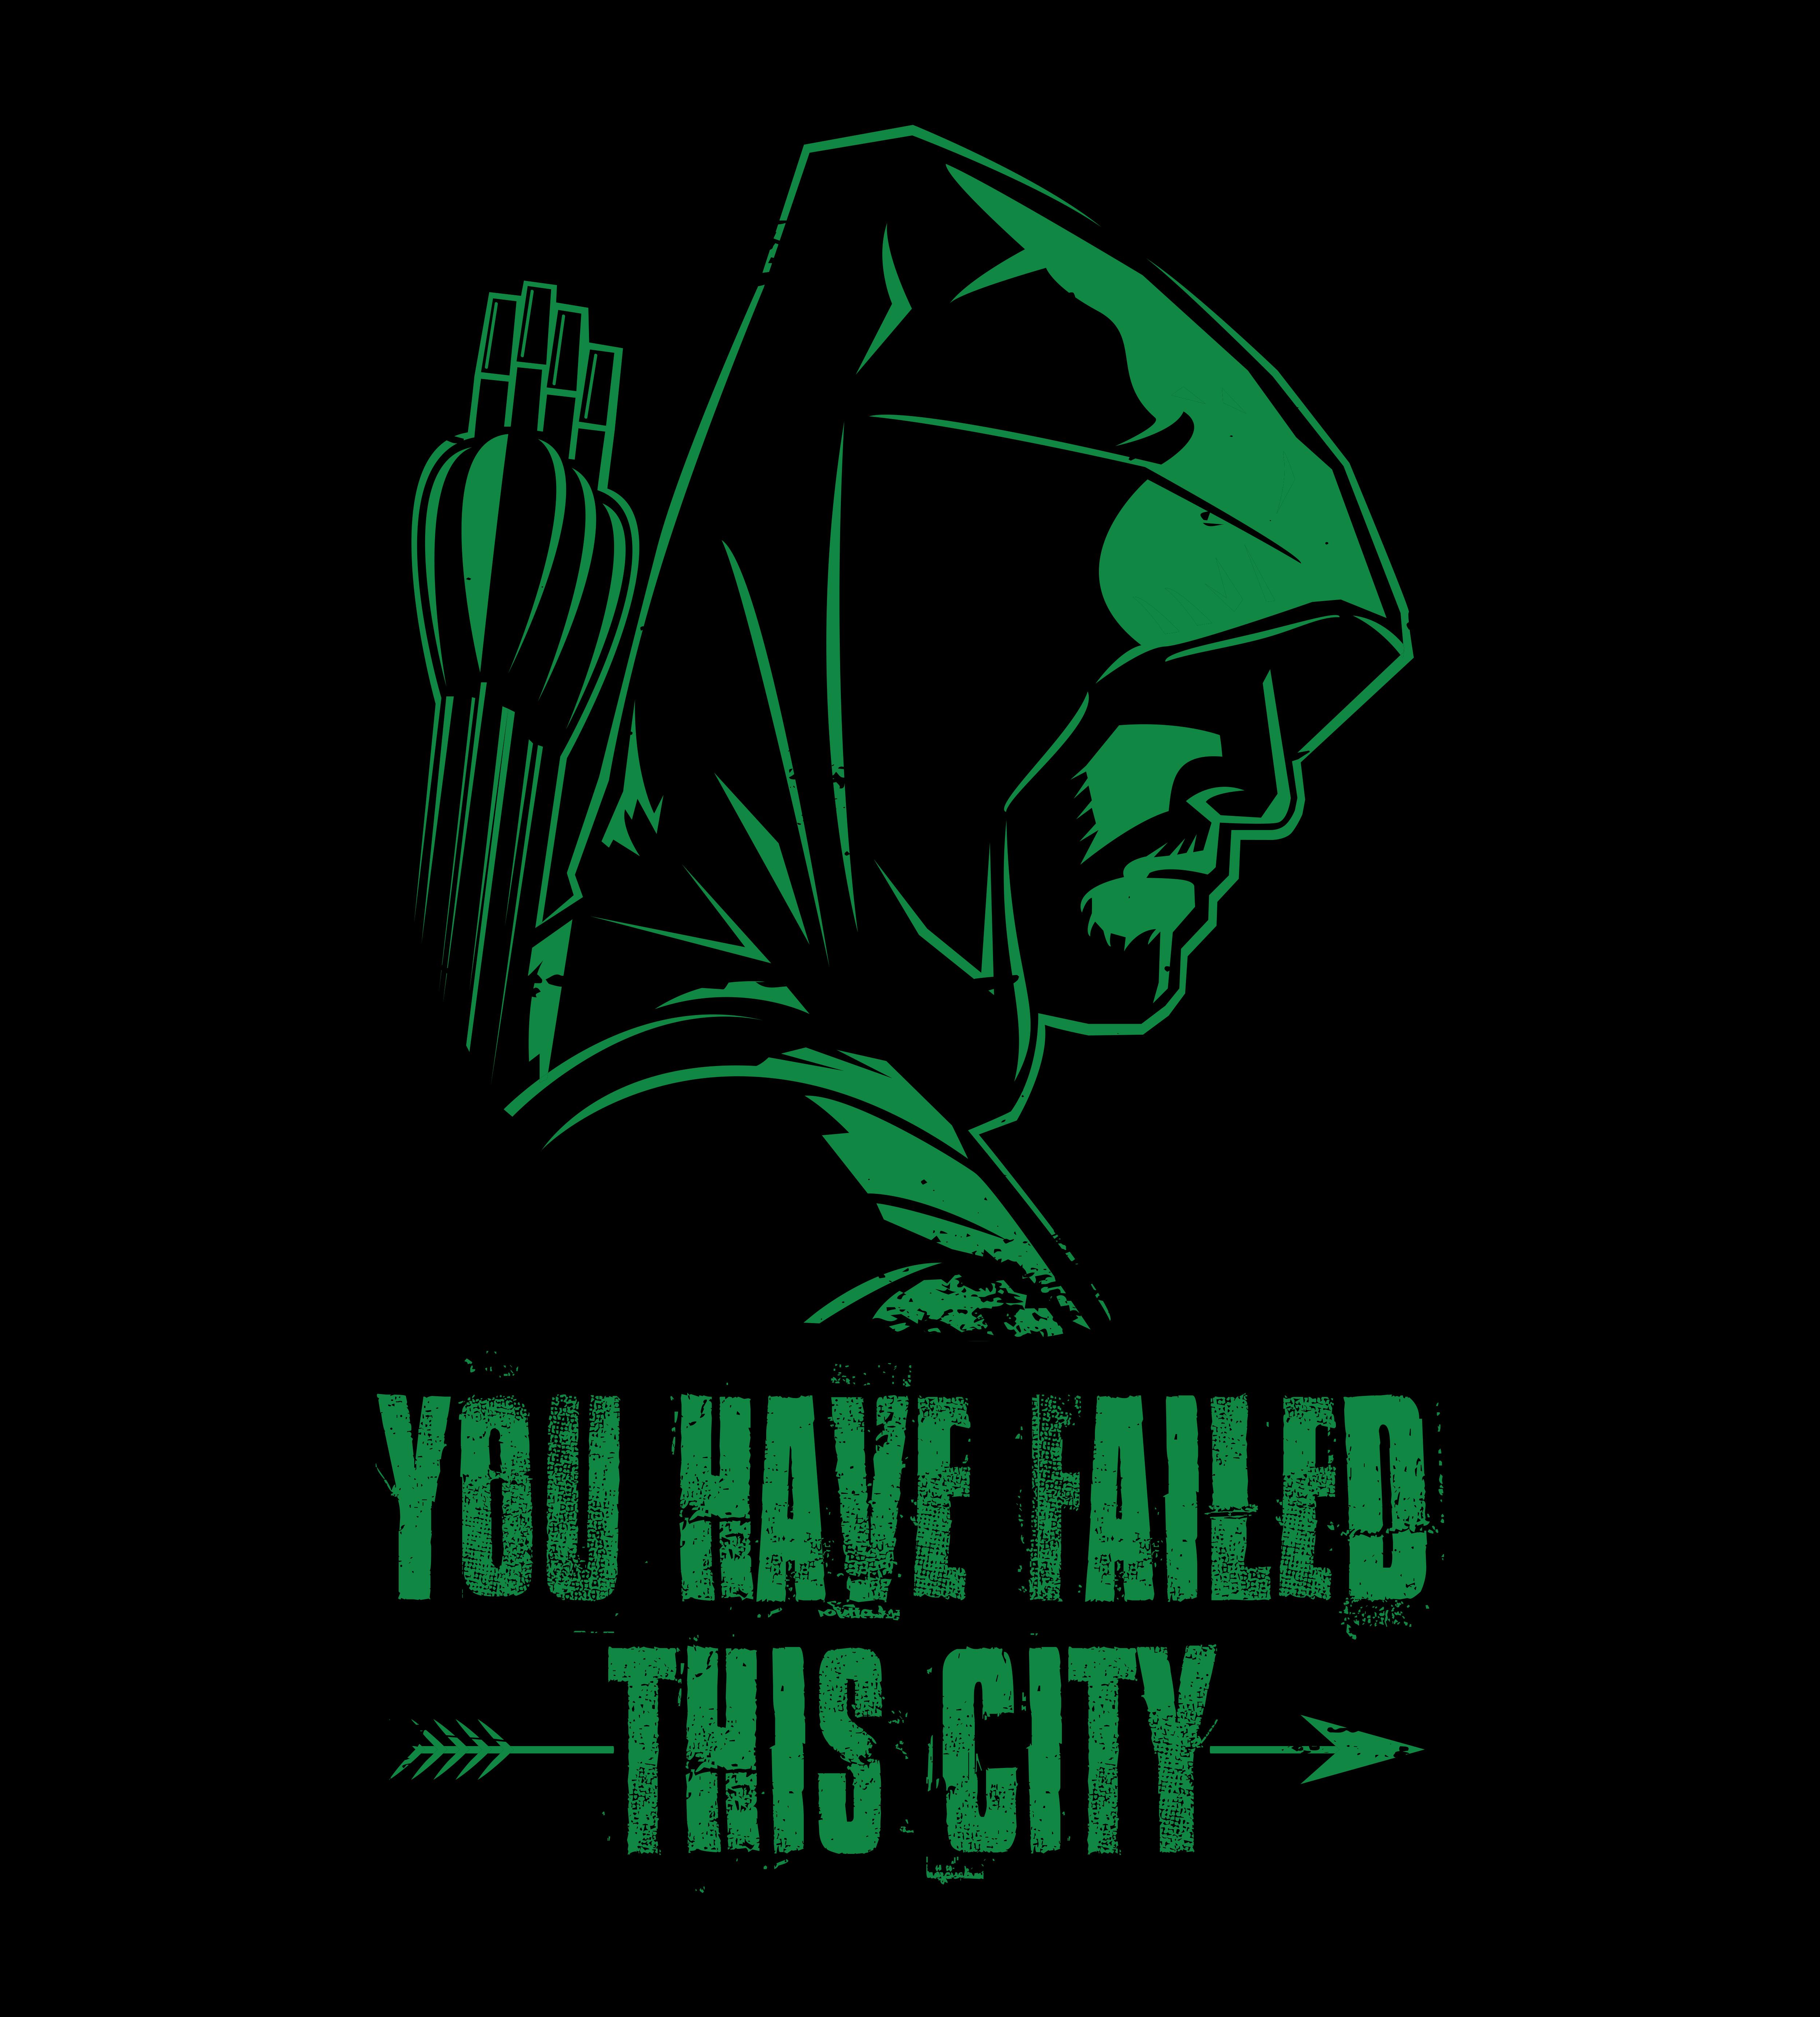 Cw Logo Tvs Cw Logo Green Arrow Green Arrow Logo Arrow Artwork